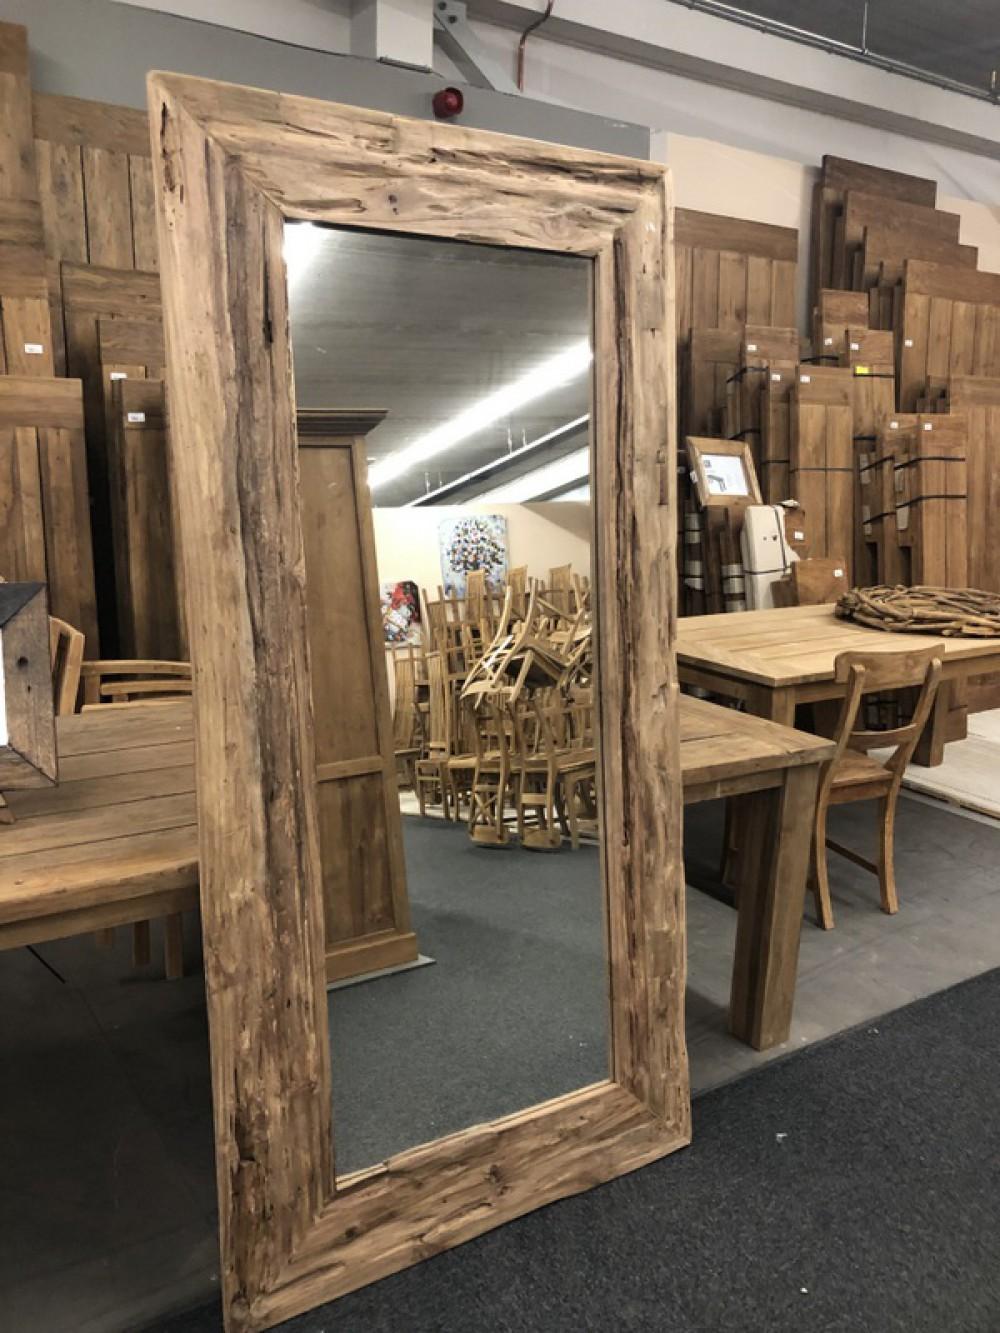 Spiegel Massivholz Teak, Wandspiegel, Maße 200 x 1